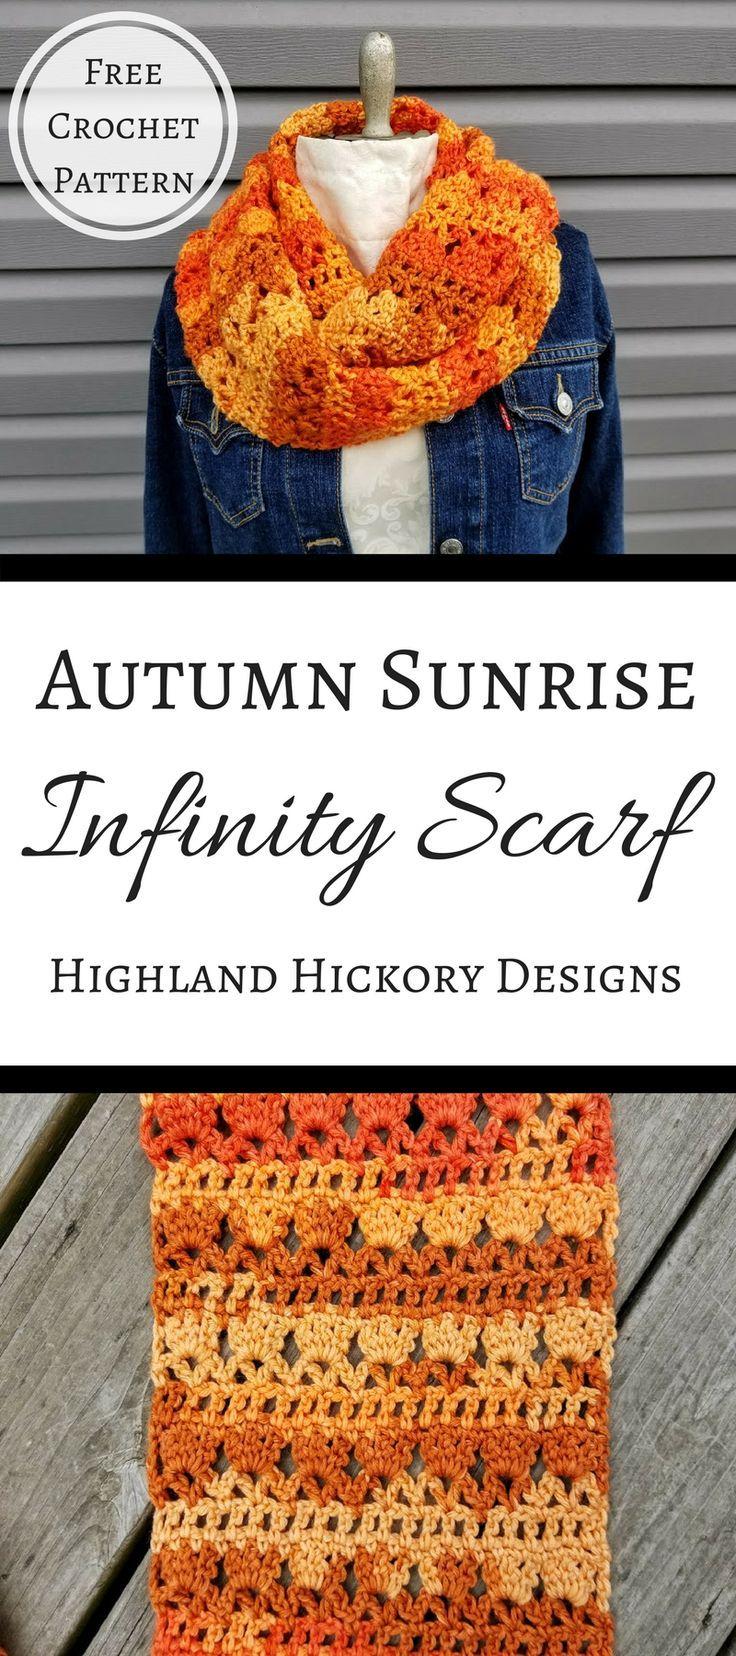 Autumn Sunrise Infinity Scarf | Patrones y Tejido